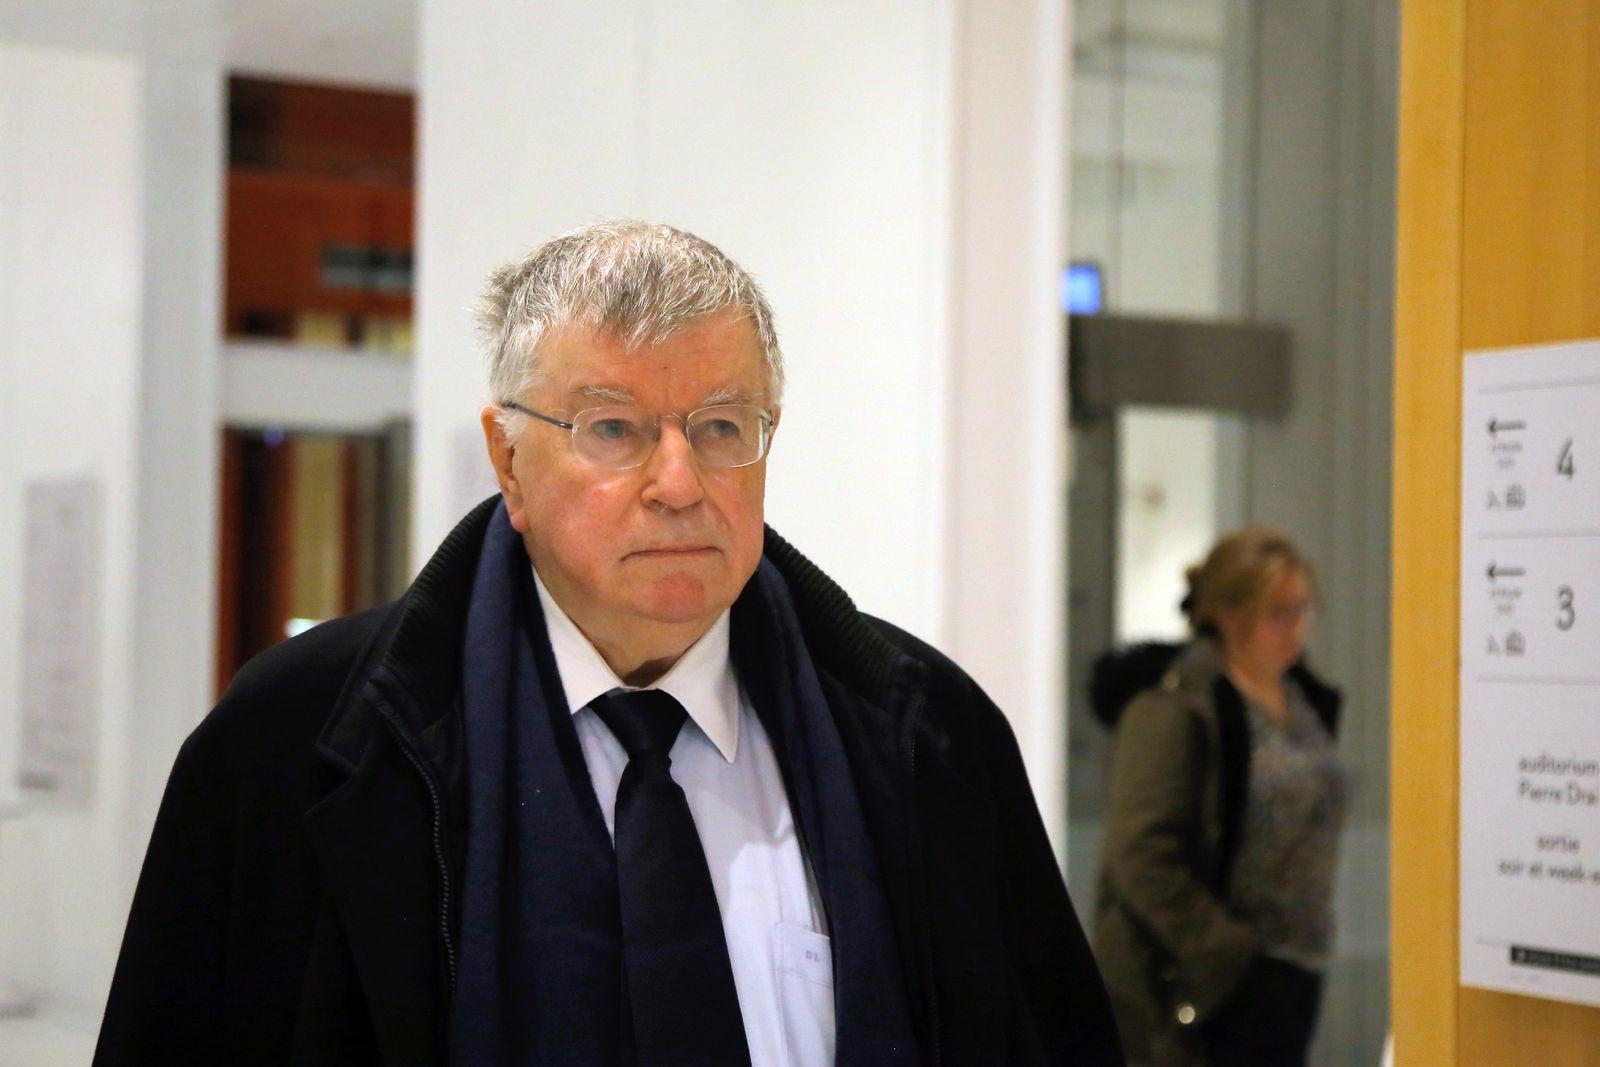 Urteil im Prozess um France Telecom/ Didier Lombard